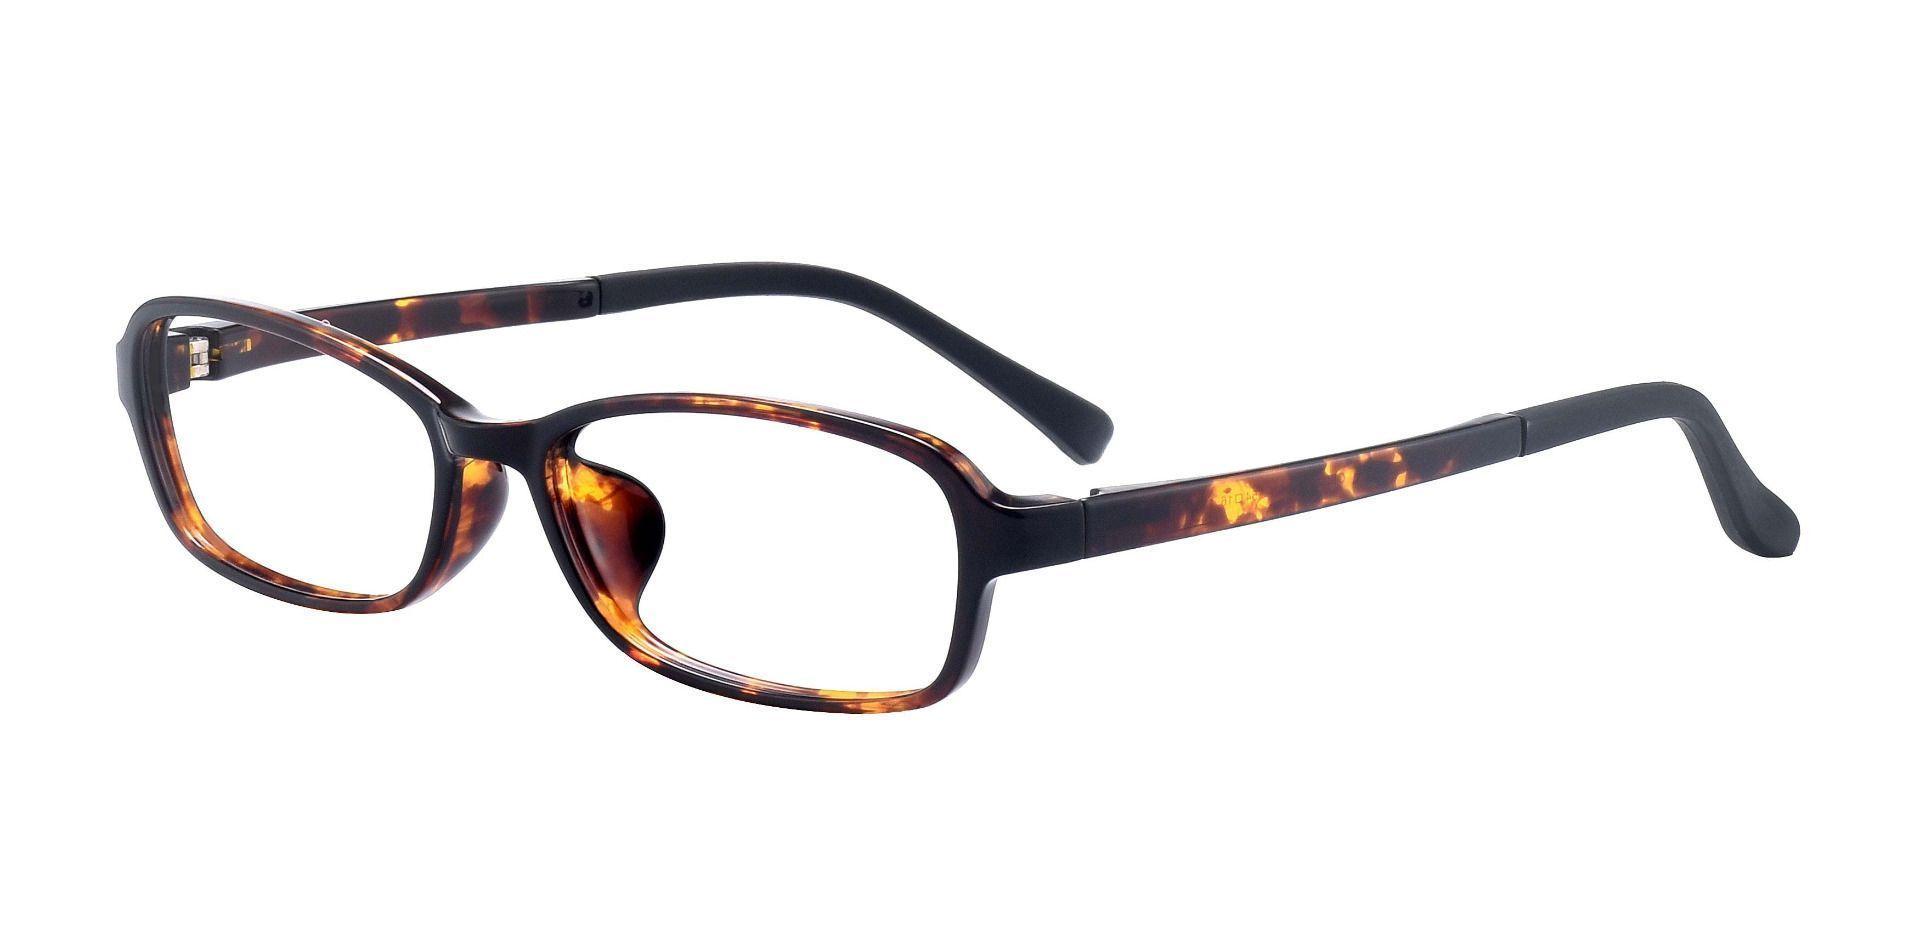 Hollis Rectangle Prescription Glasses - Tortoise